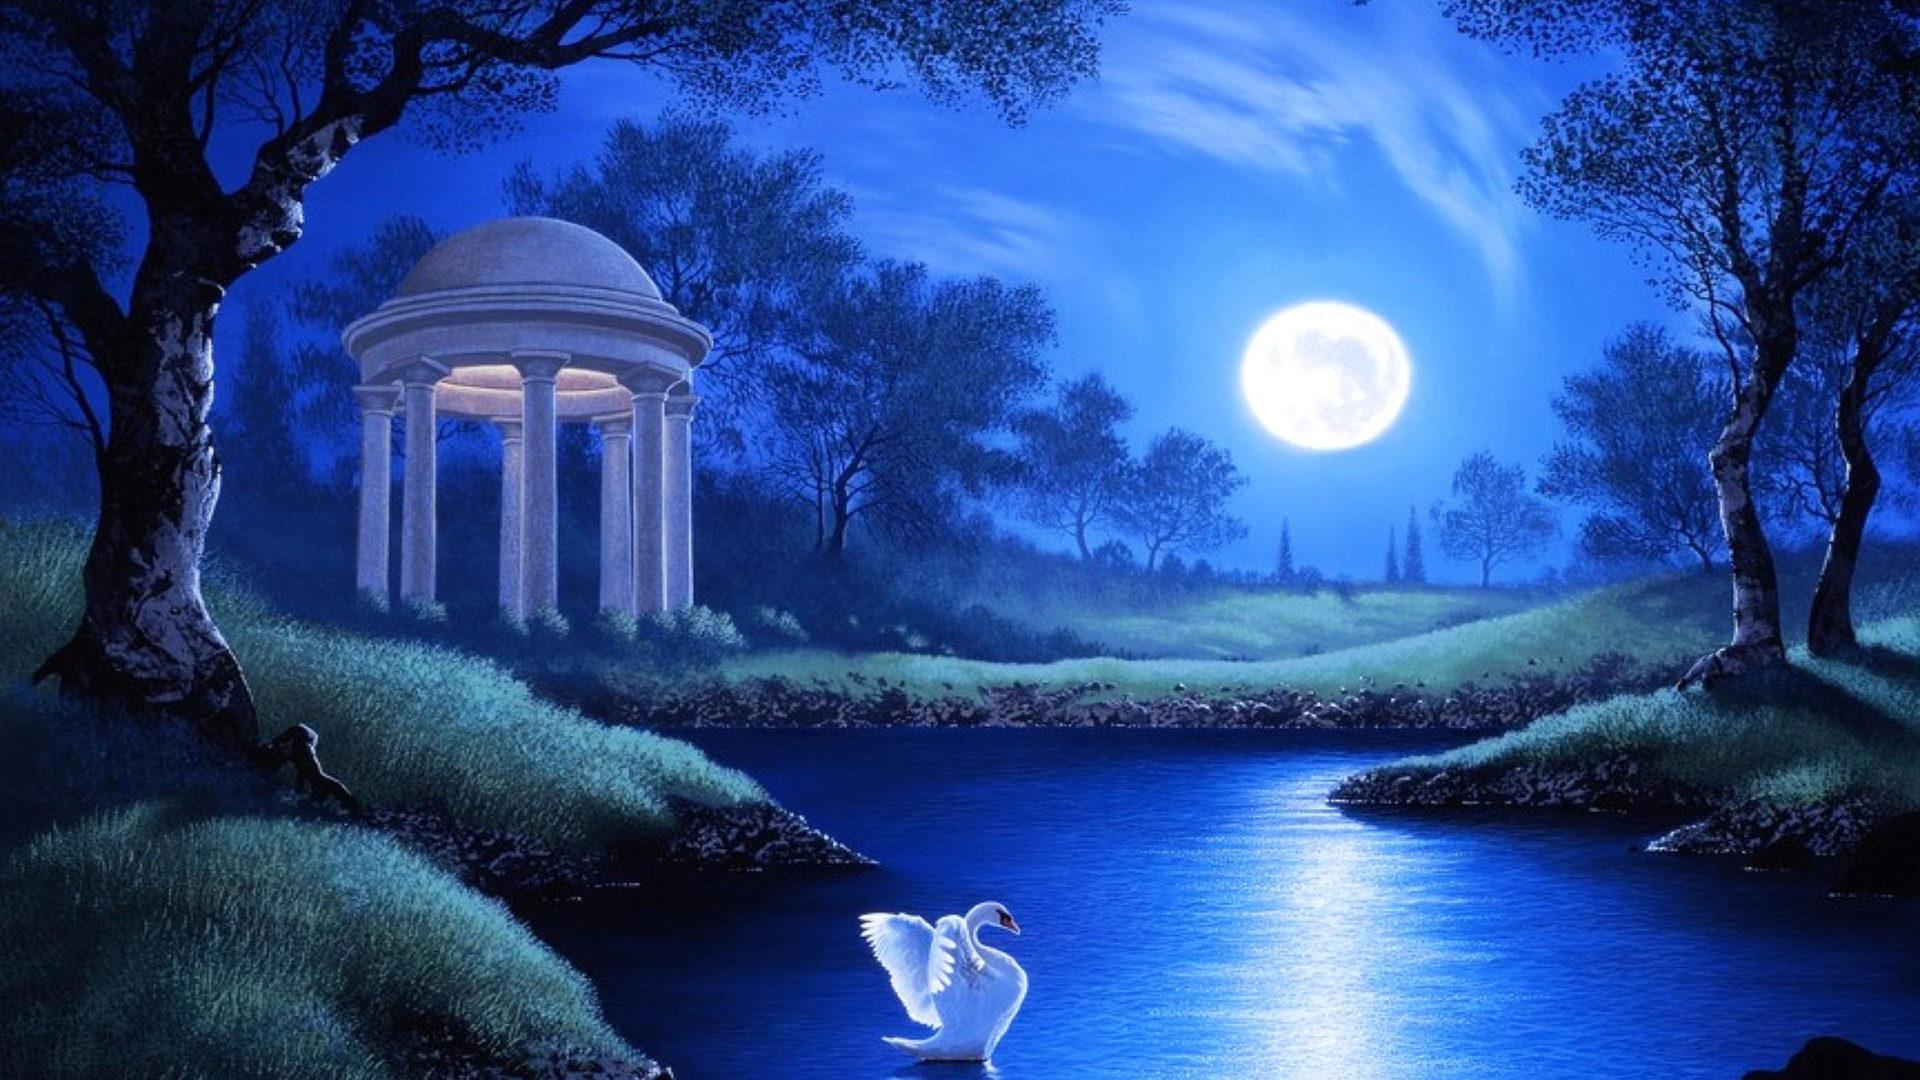 Halloween Fall Iphone Wallpaper Swan Lake Night Full Moon Trees Grass Hd Wallpaper